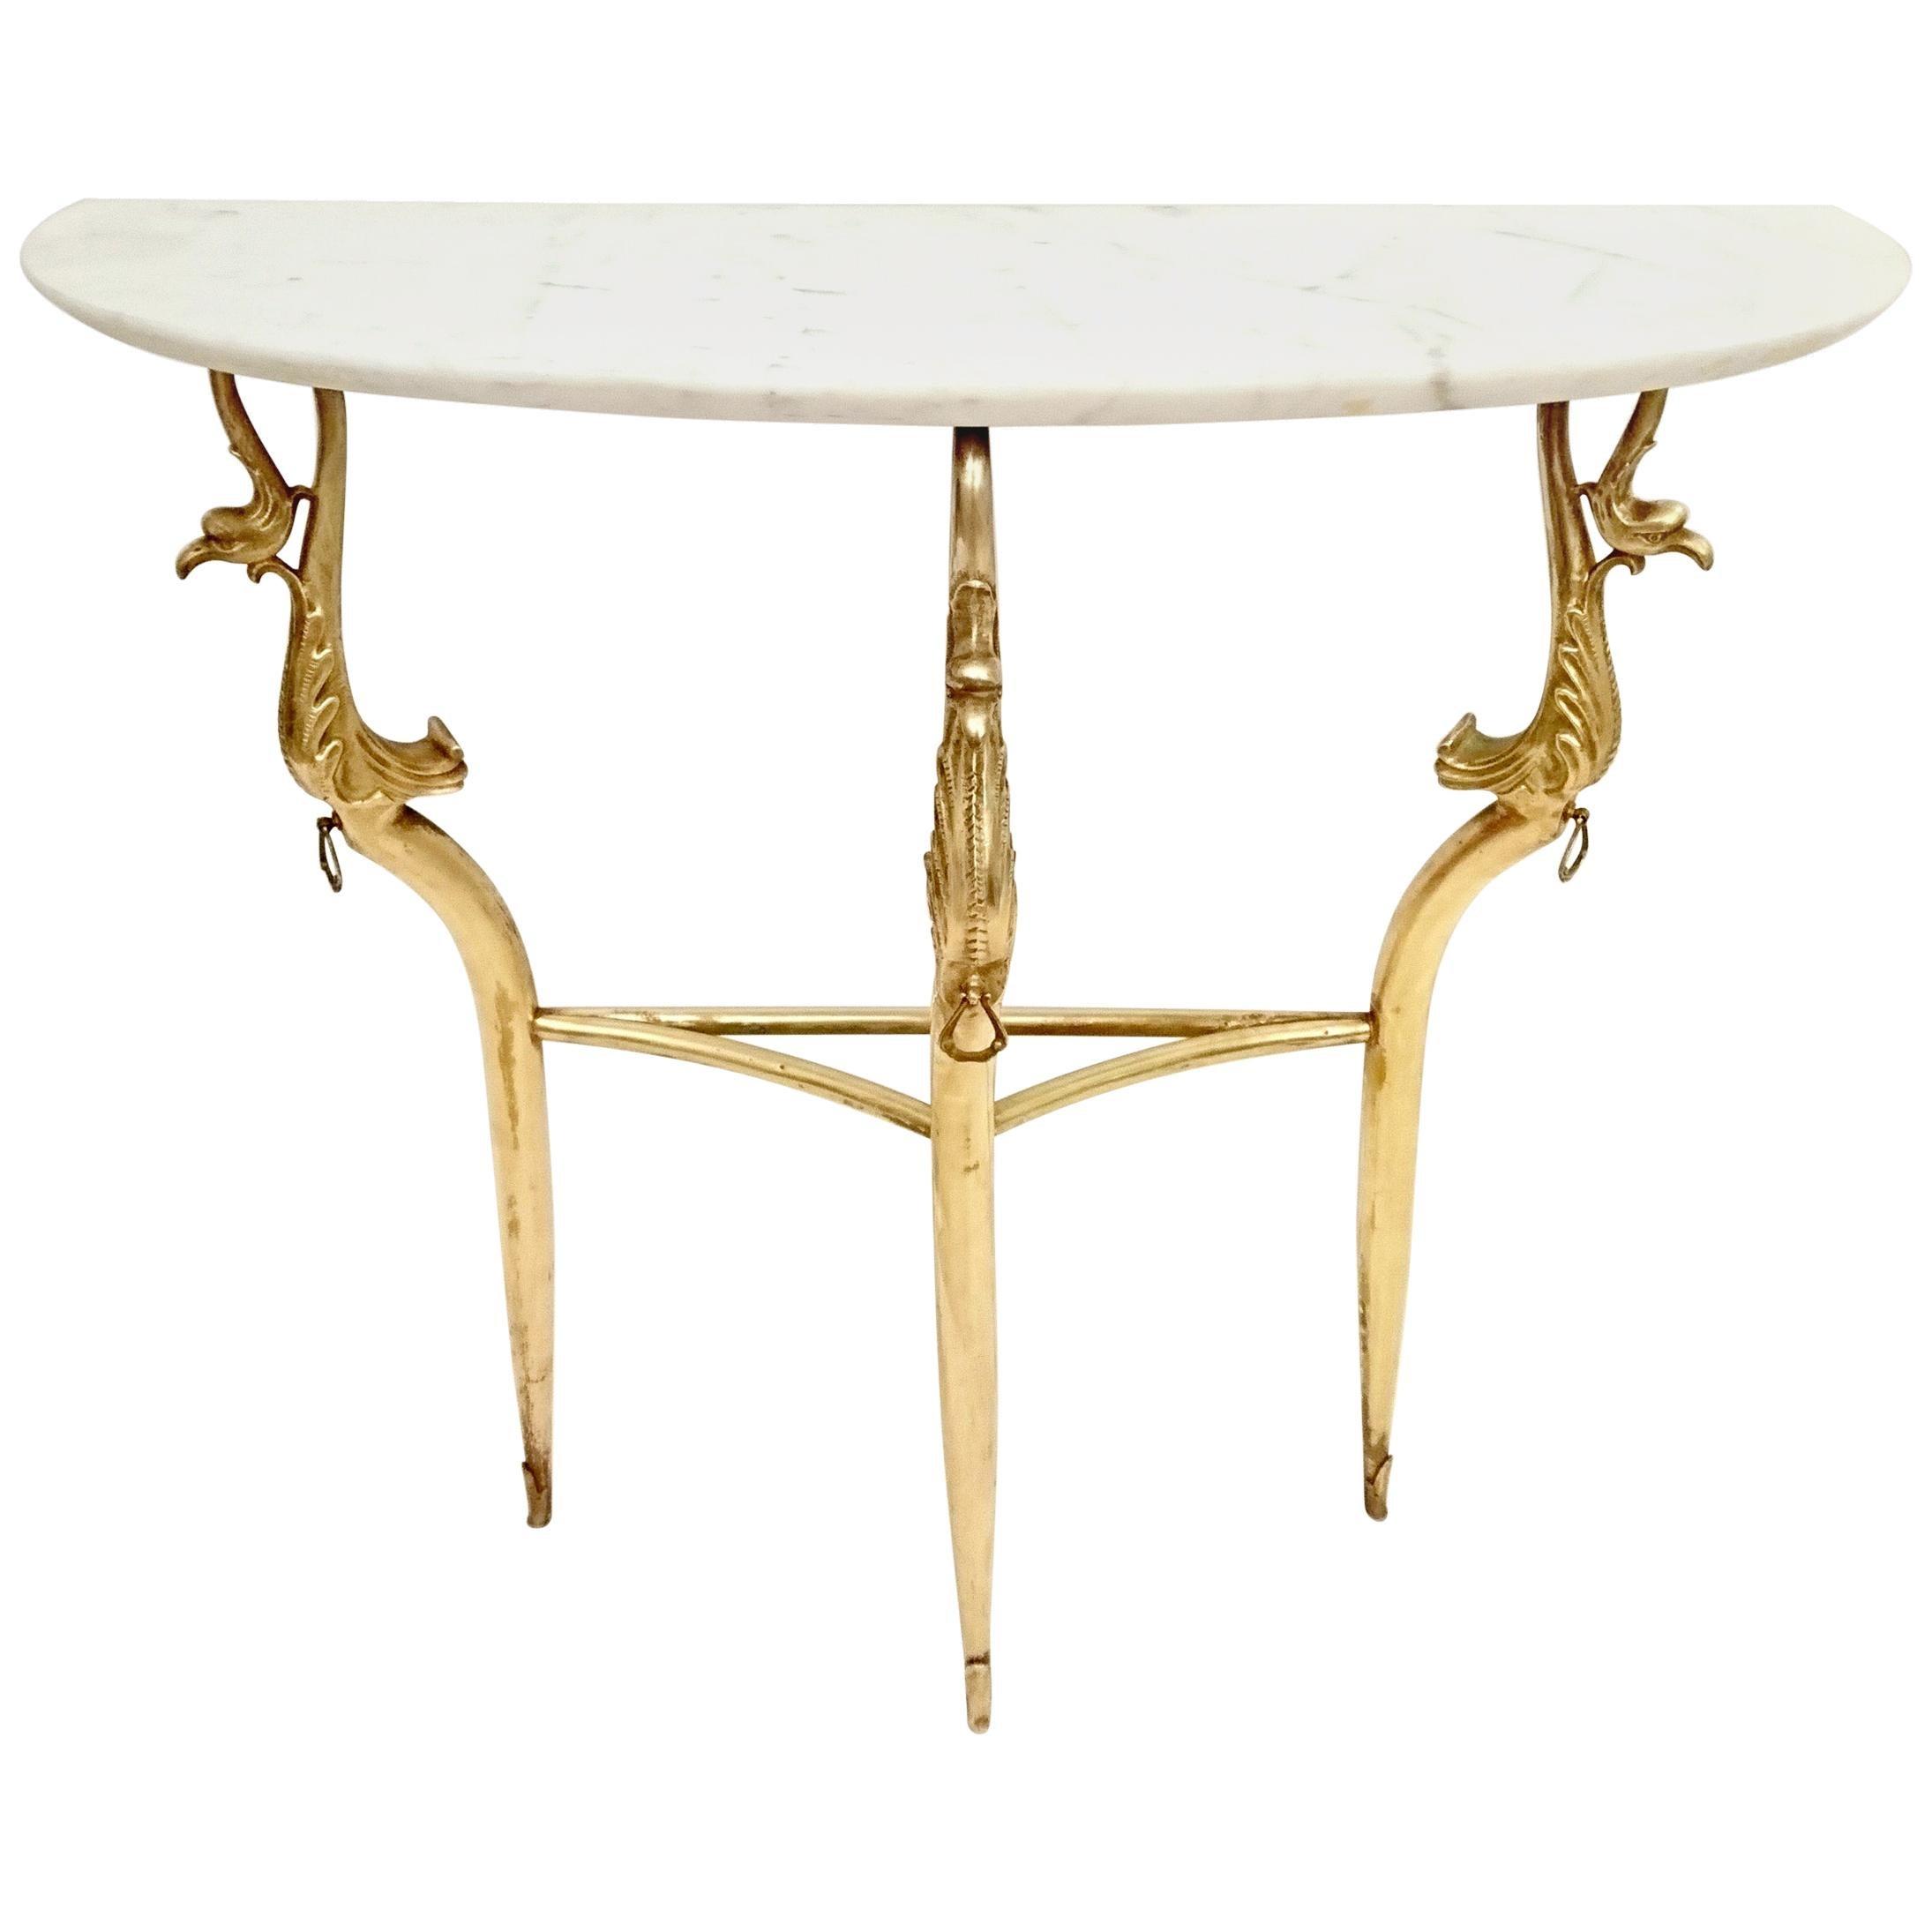 Midcentury Italian Marble Console Table